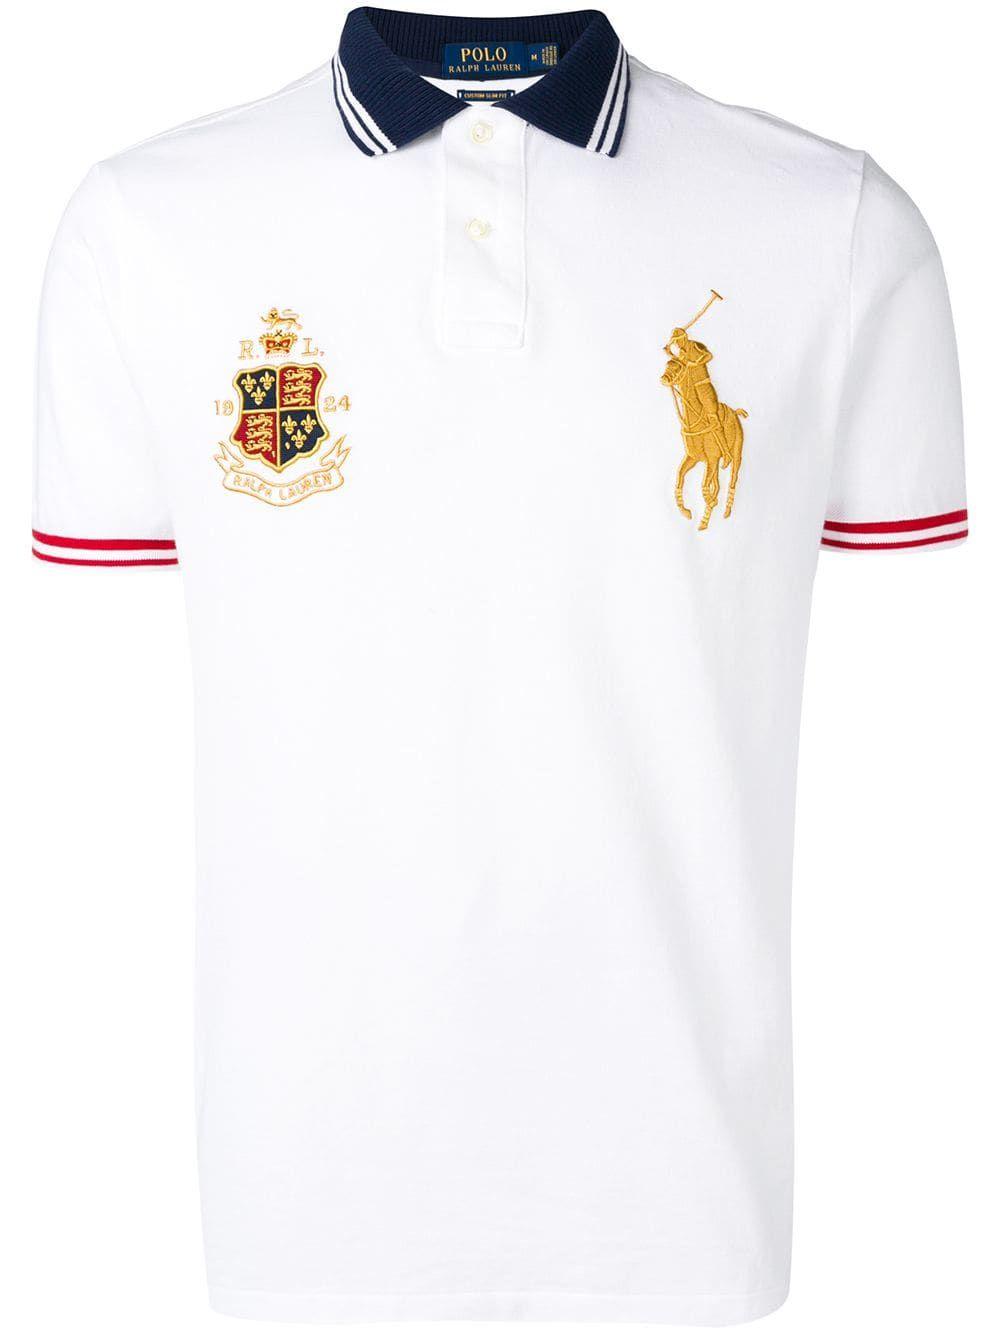 Polo Ralph Lauren Big /& Tall Blackwatch Big Pony /& Crest Logo Polo Shirt